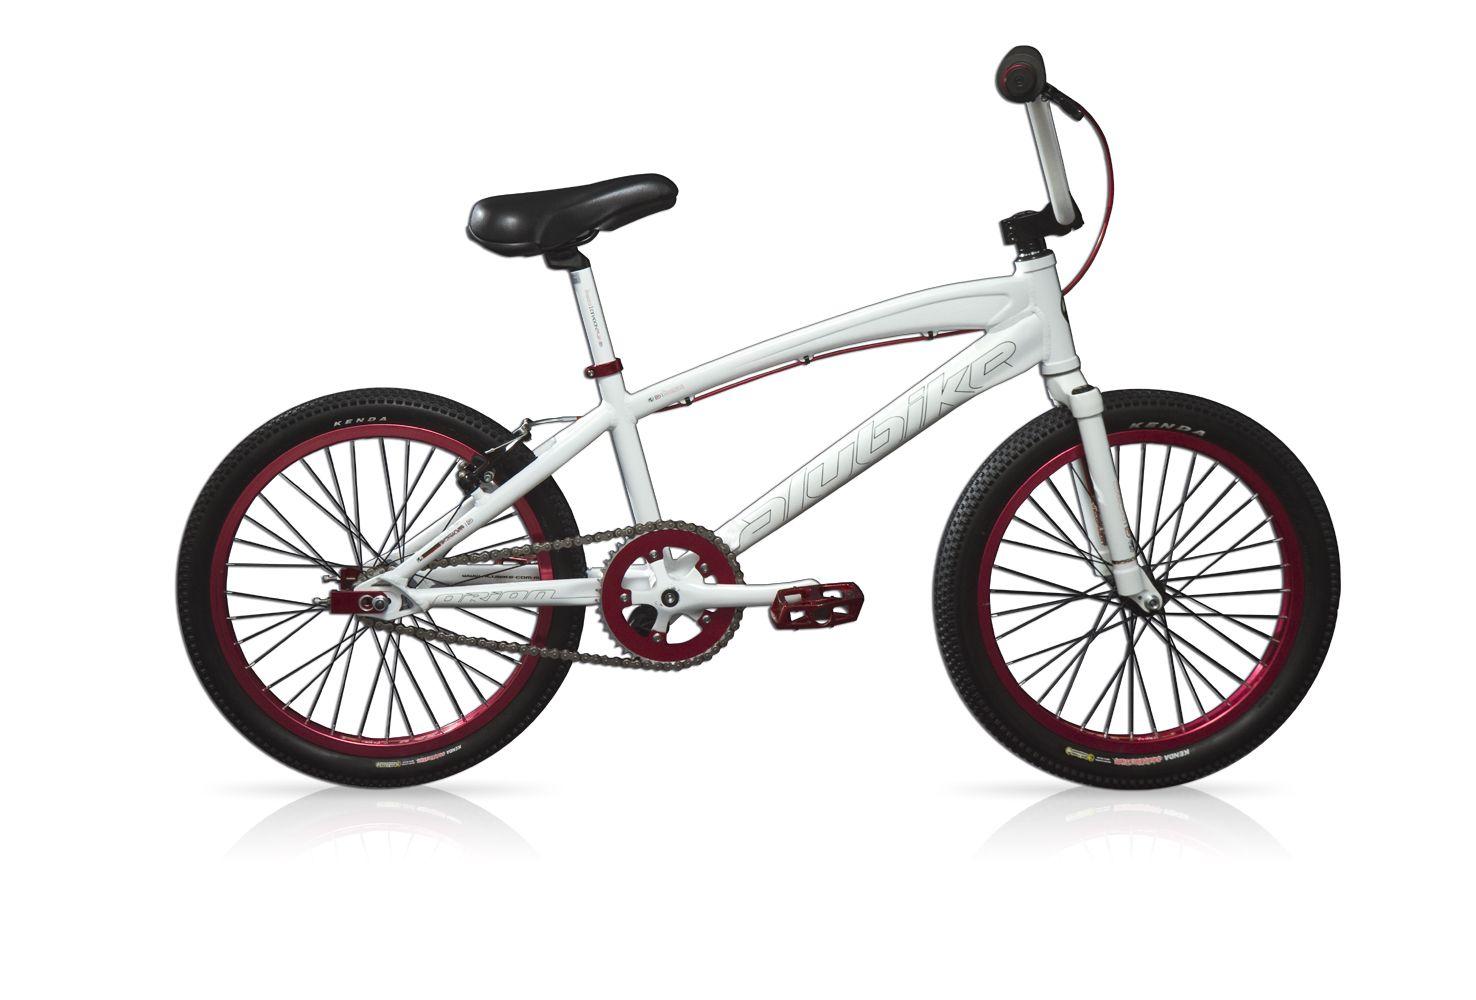 Alubike Orion Bicicleta BMX Blanca https://www.facebook.com/Alubike ...